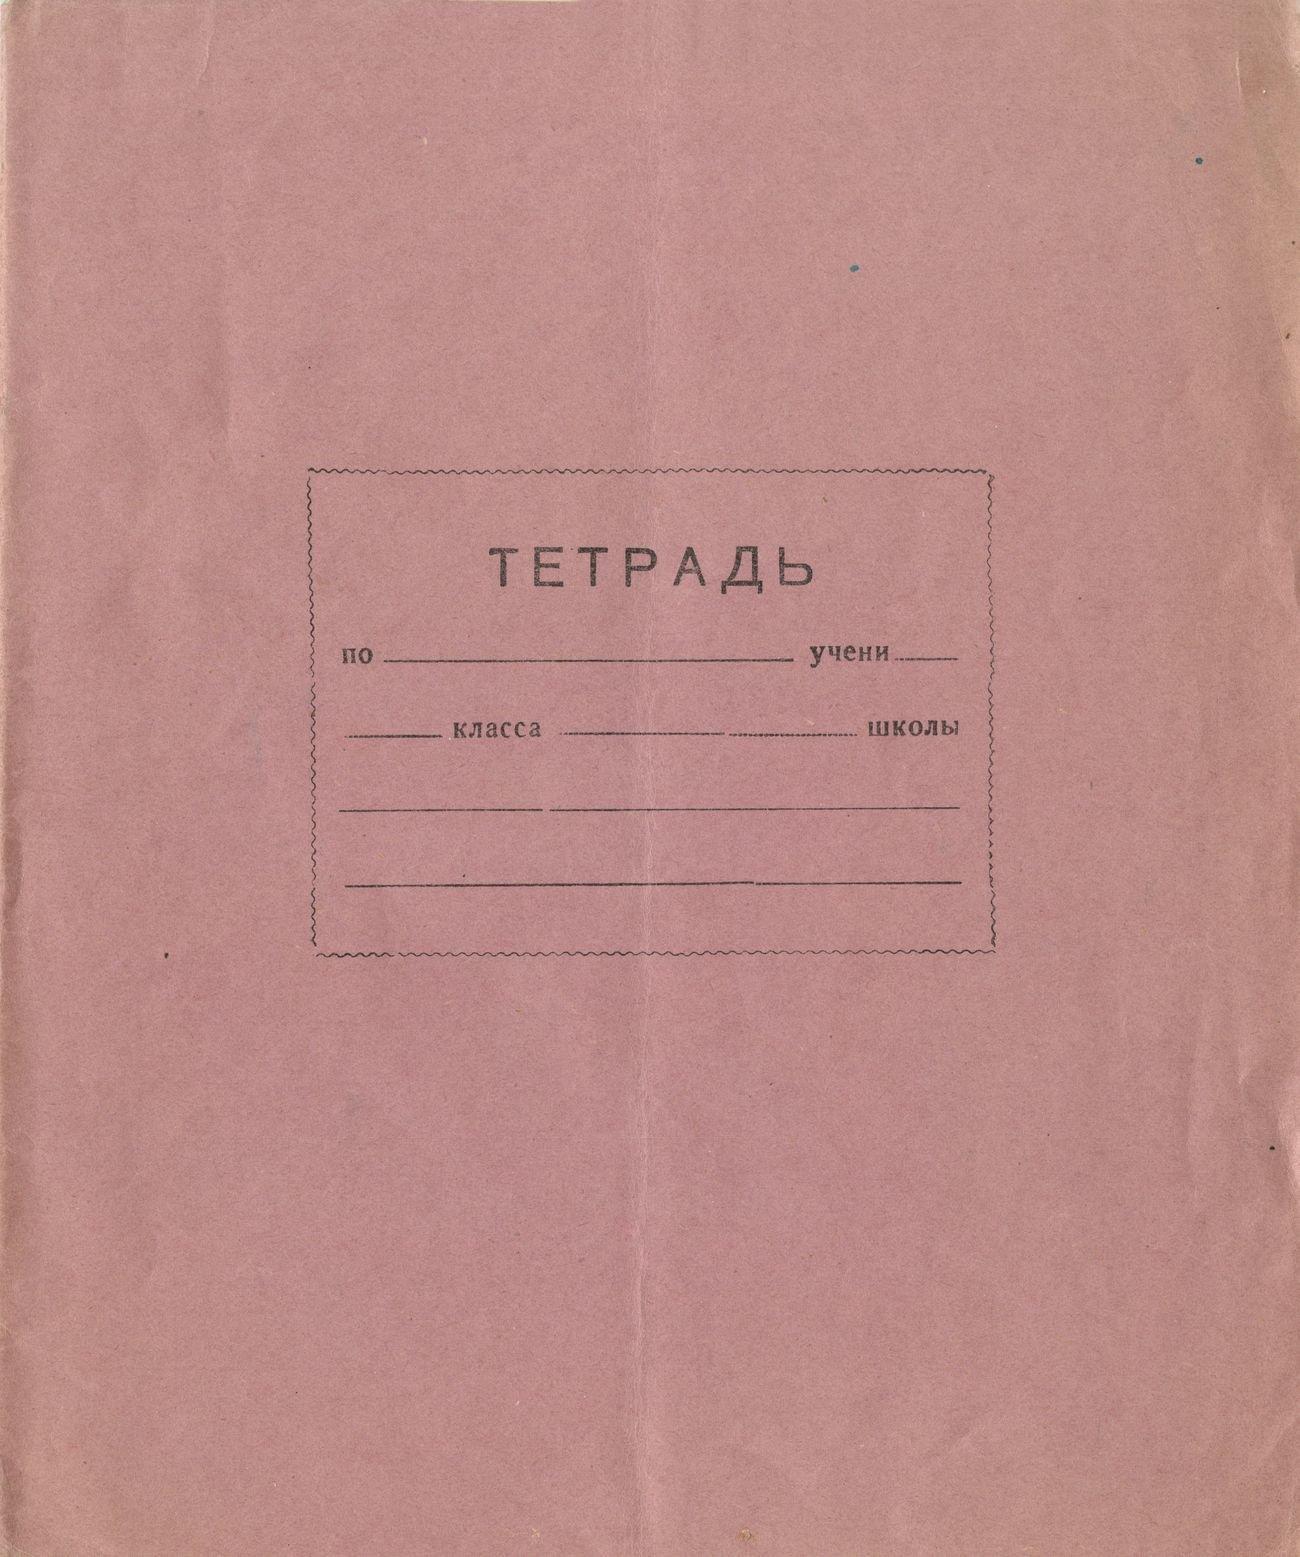 Фабрика Маяк революции, 1953, 170х205